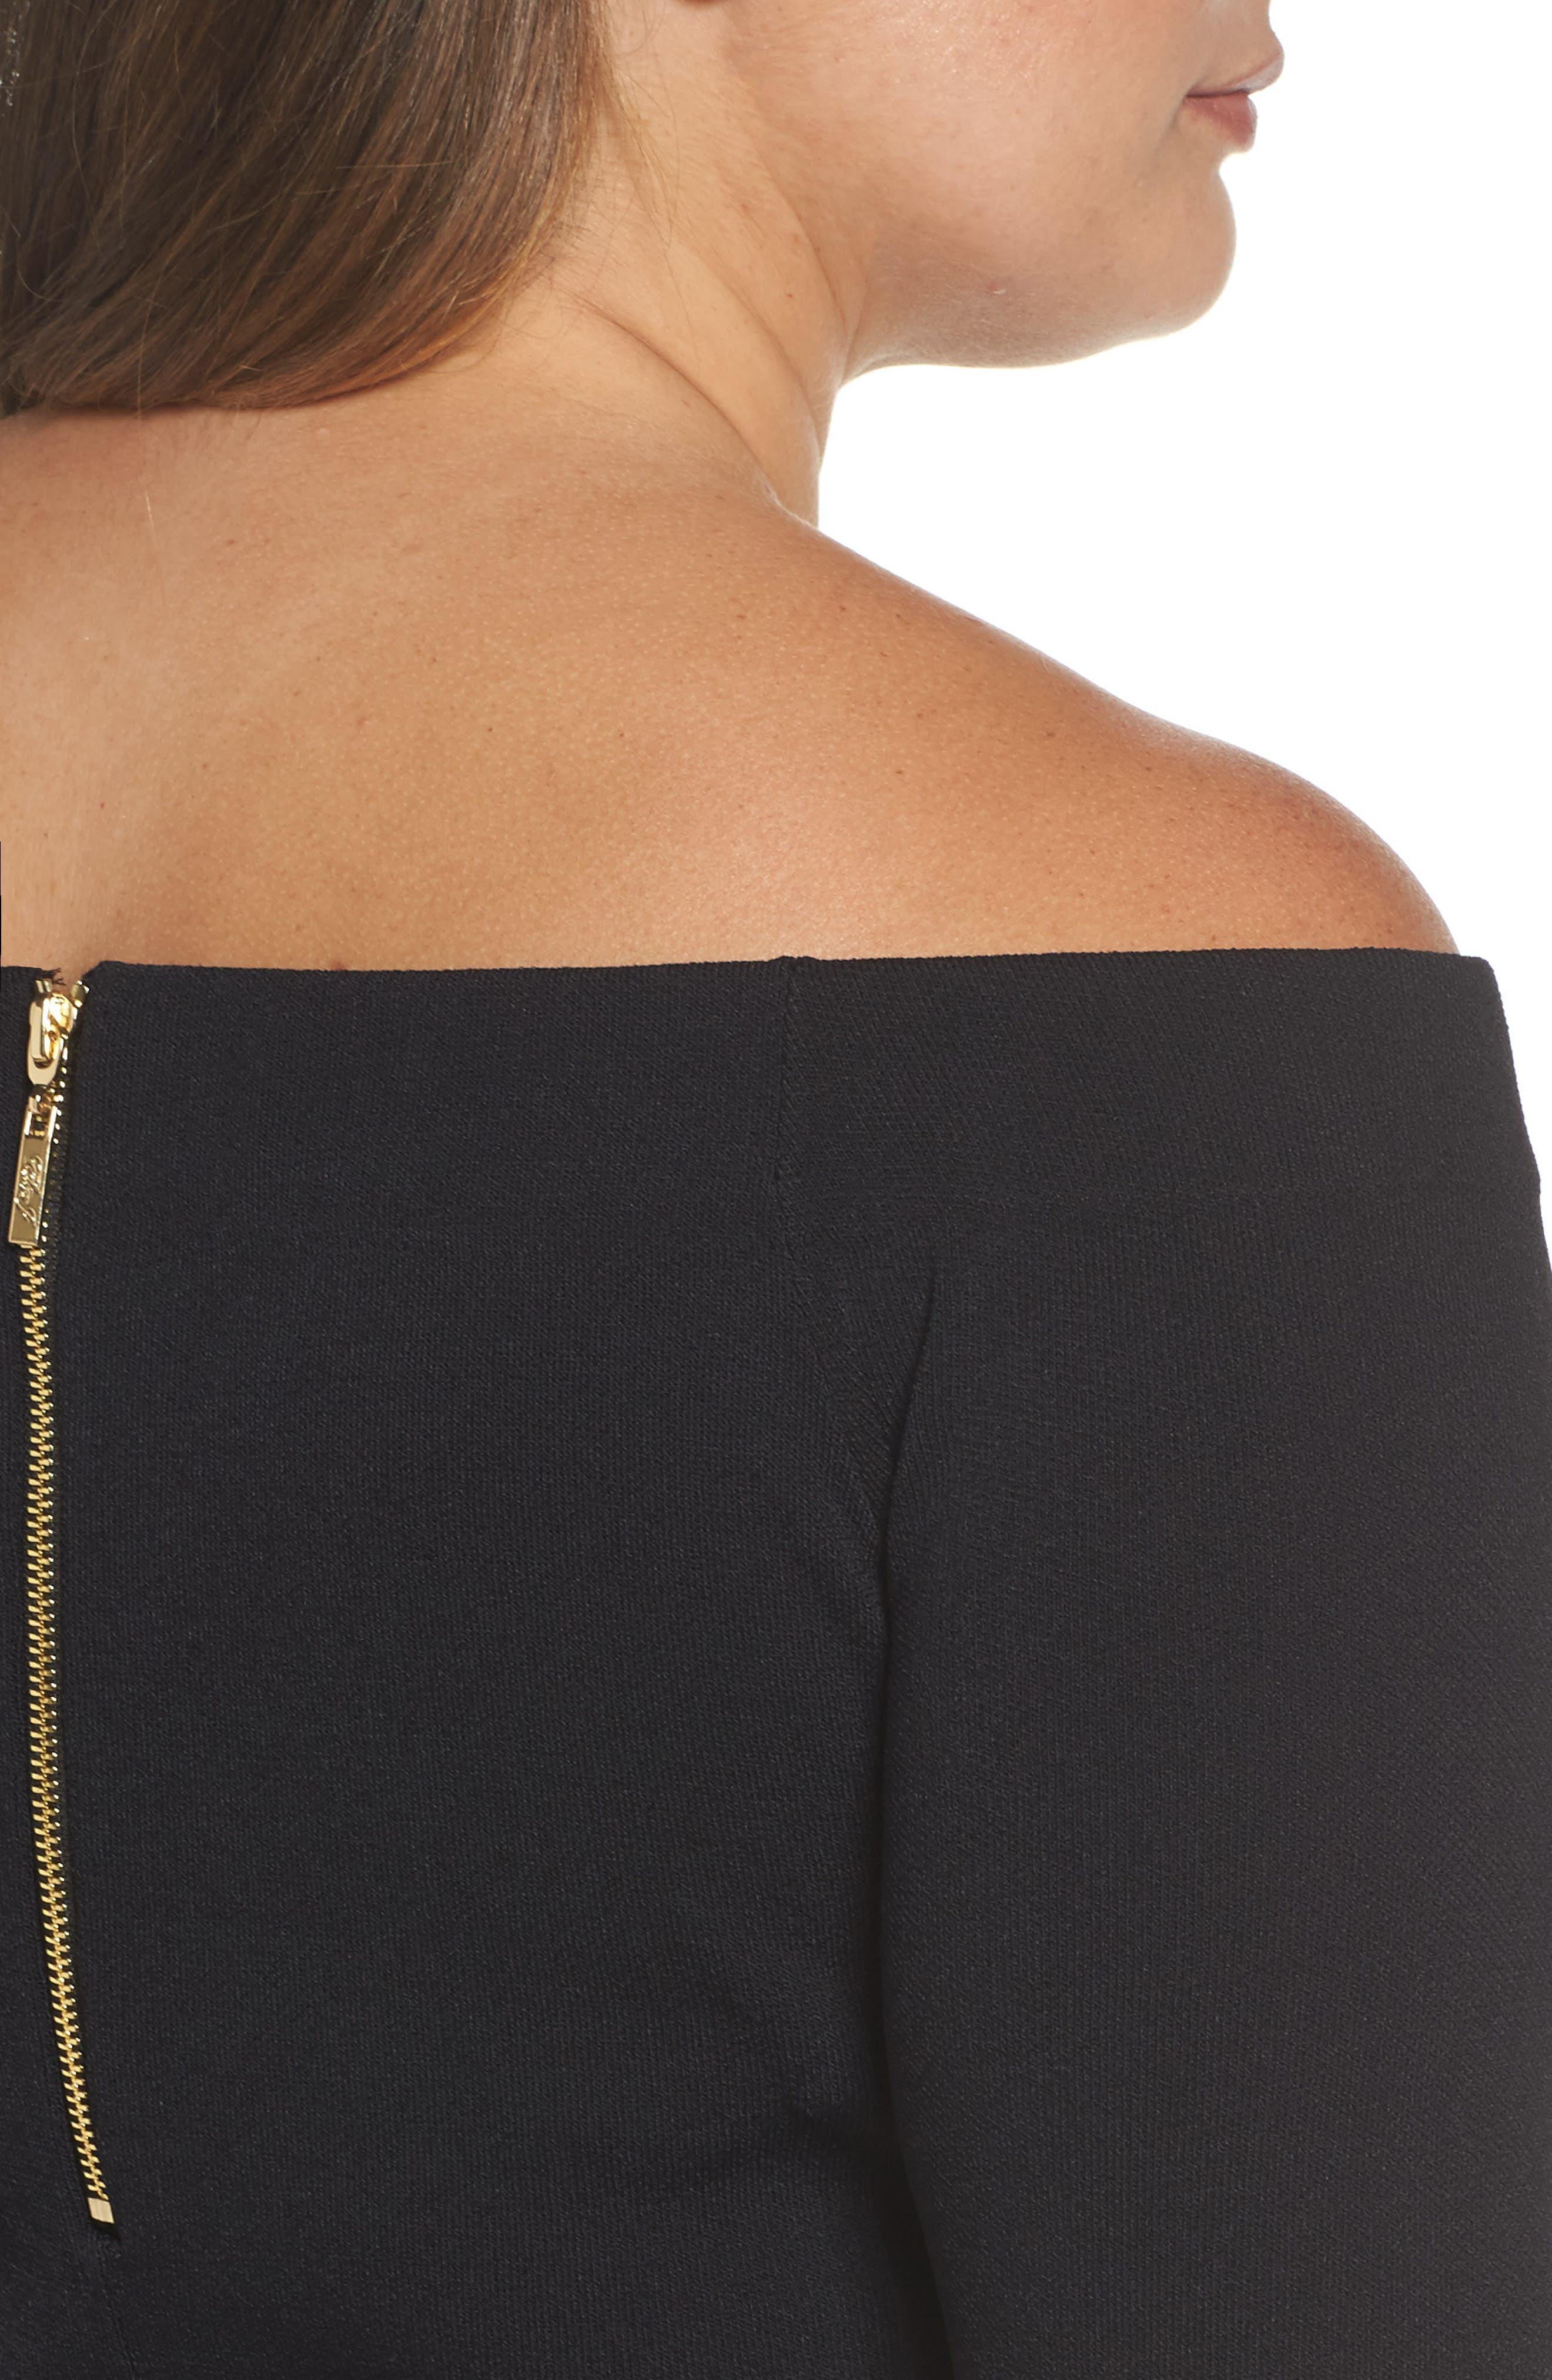 Alternate Image 4  - Eliza J Knit Fit & Flare Dress (Plus Size)